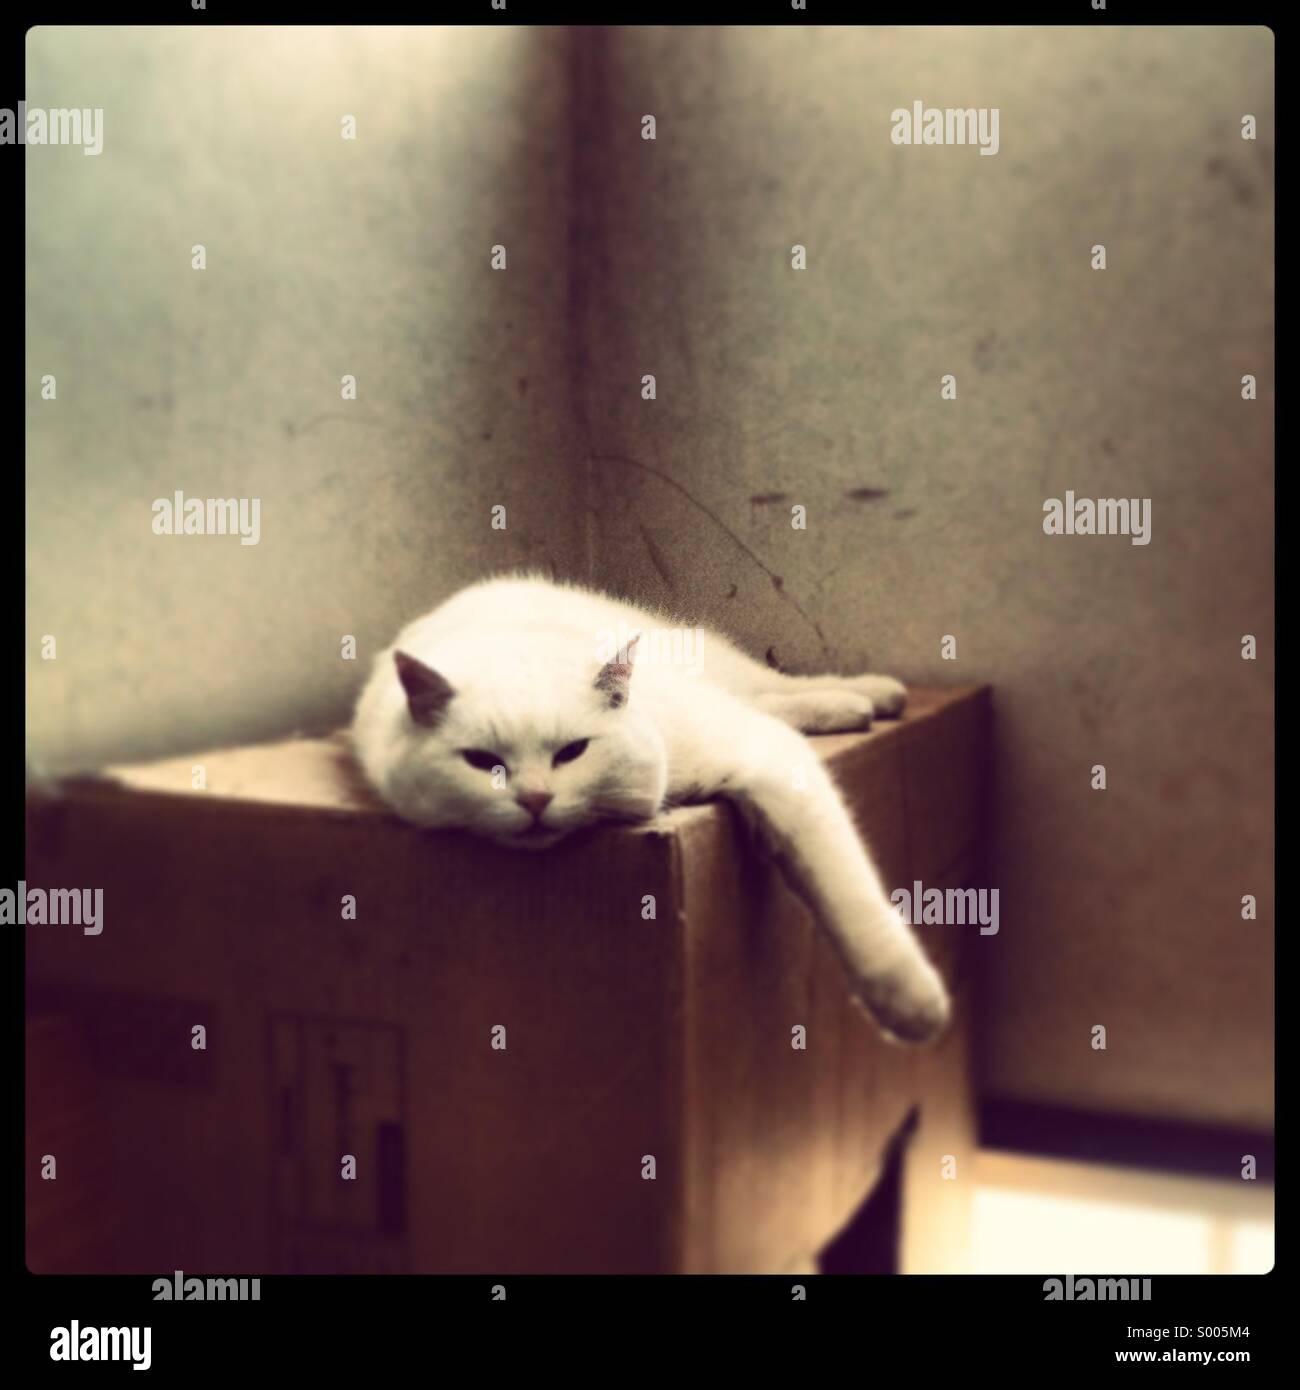 White cat sitting on cardboard box in tenement landing - Stock Image